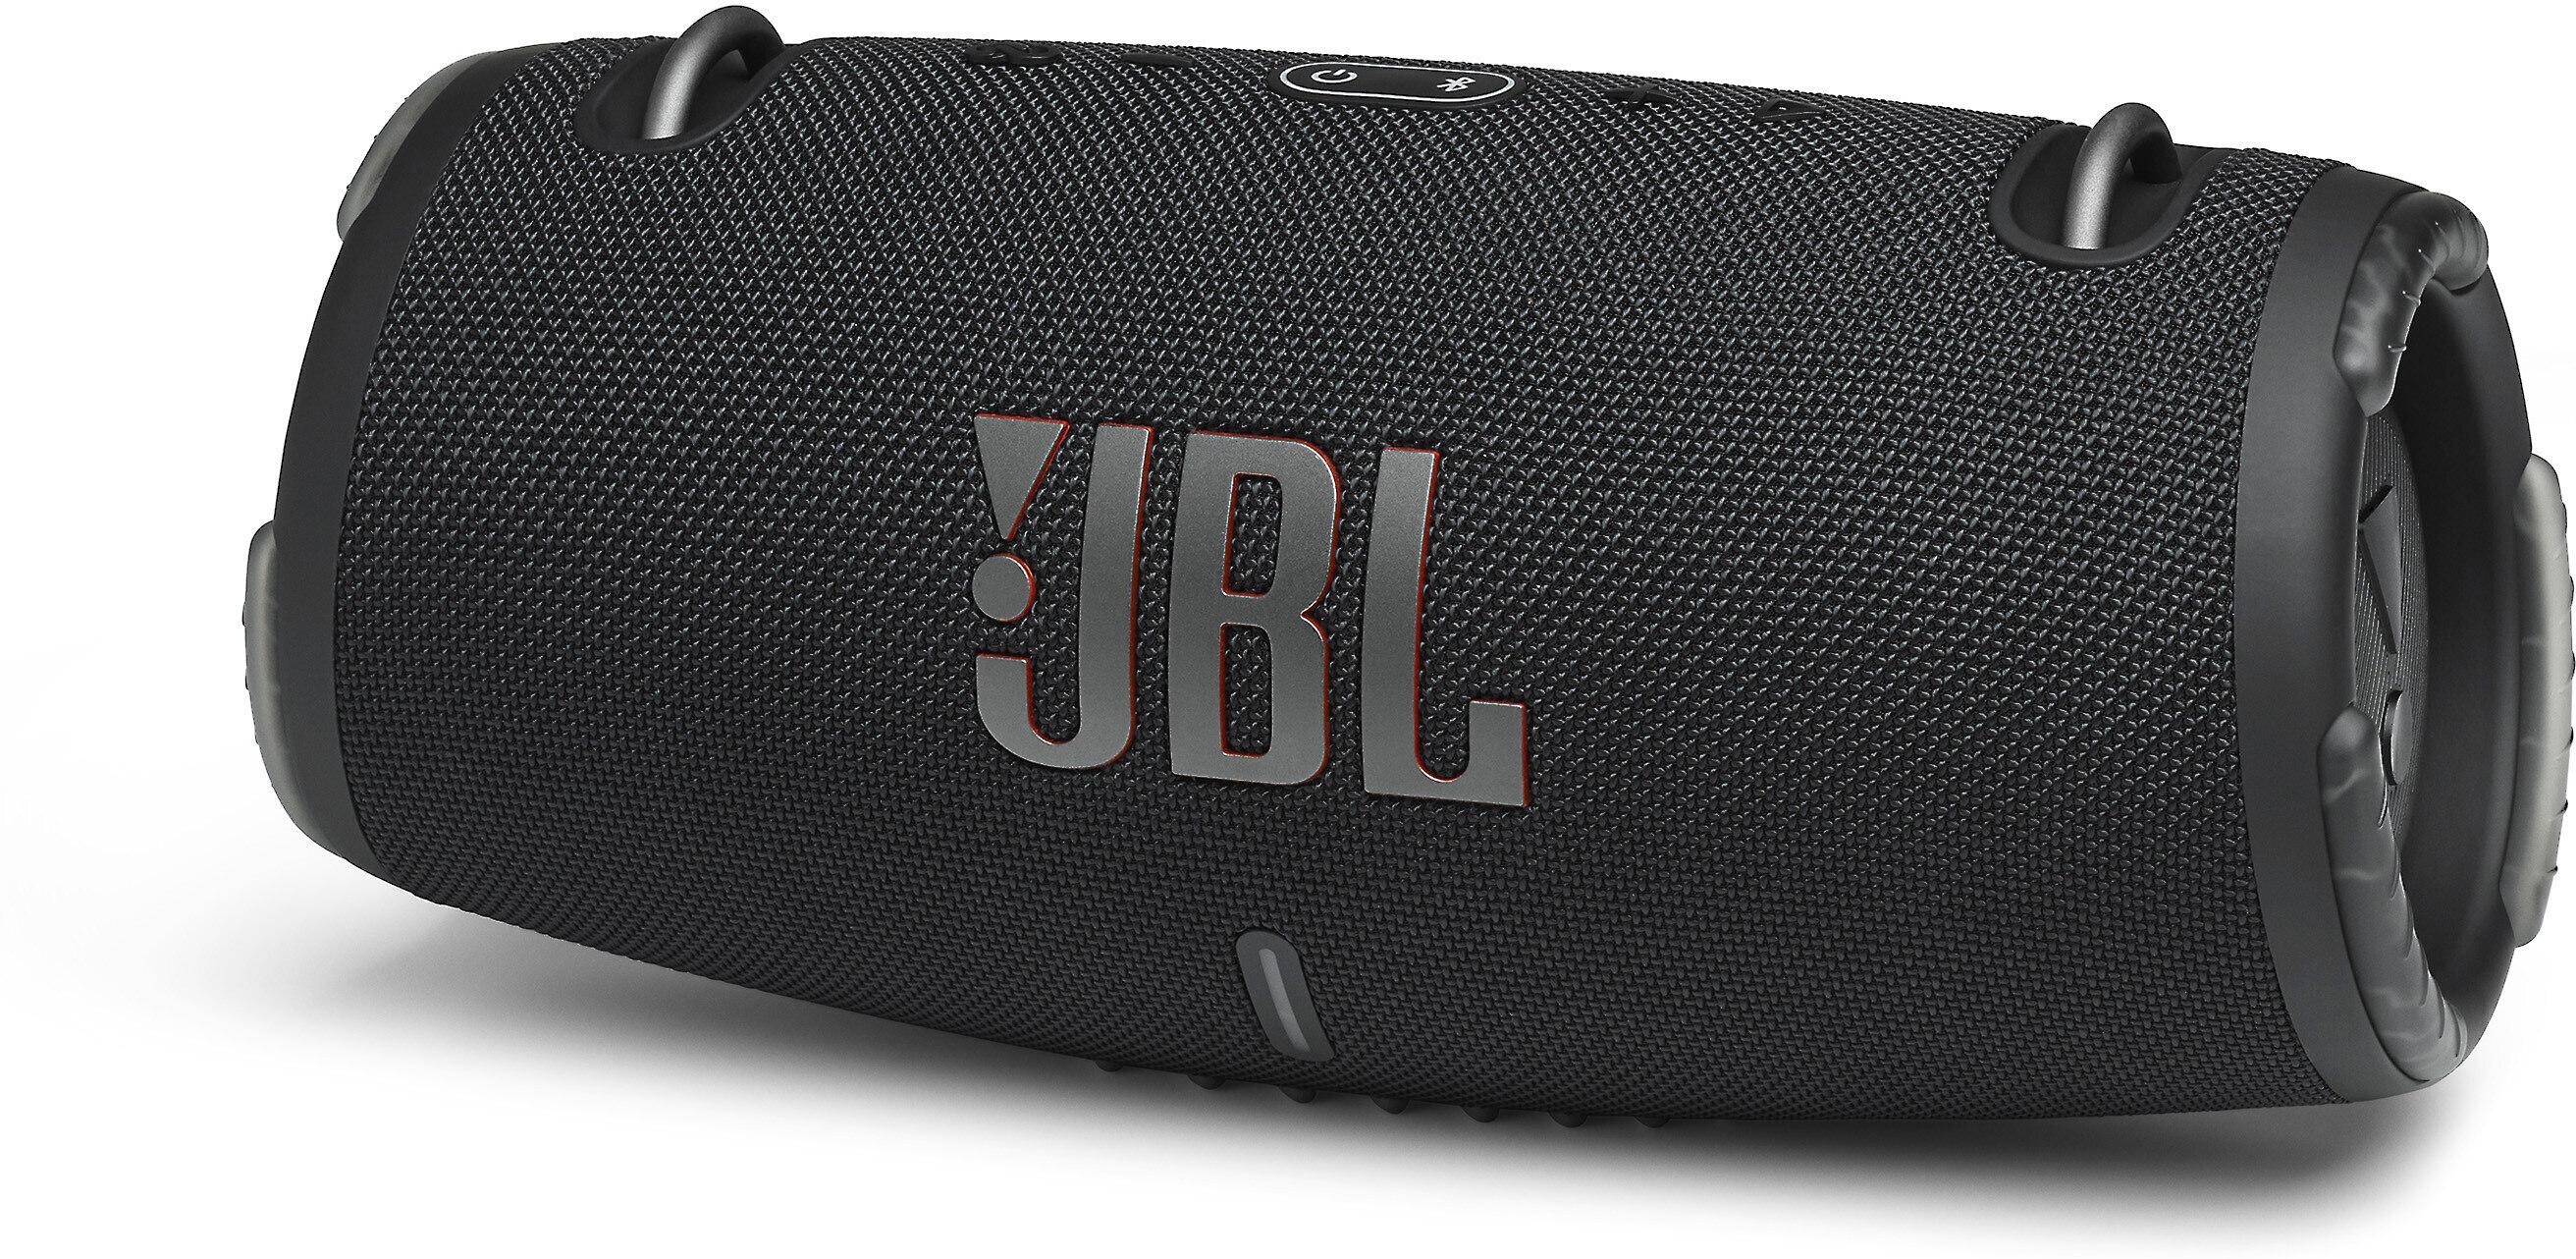 Jbl Xtreme 3 Black Waterproof Portable Bluetooth Speaker At Crutchfield